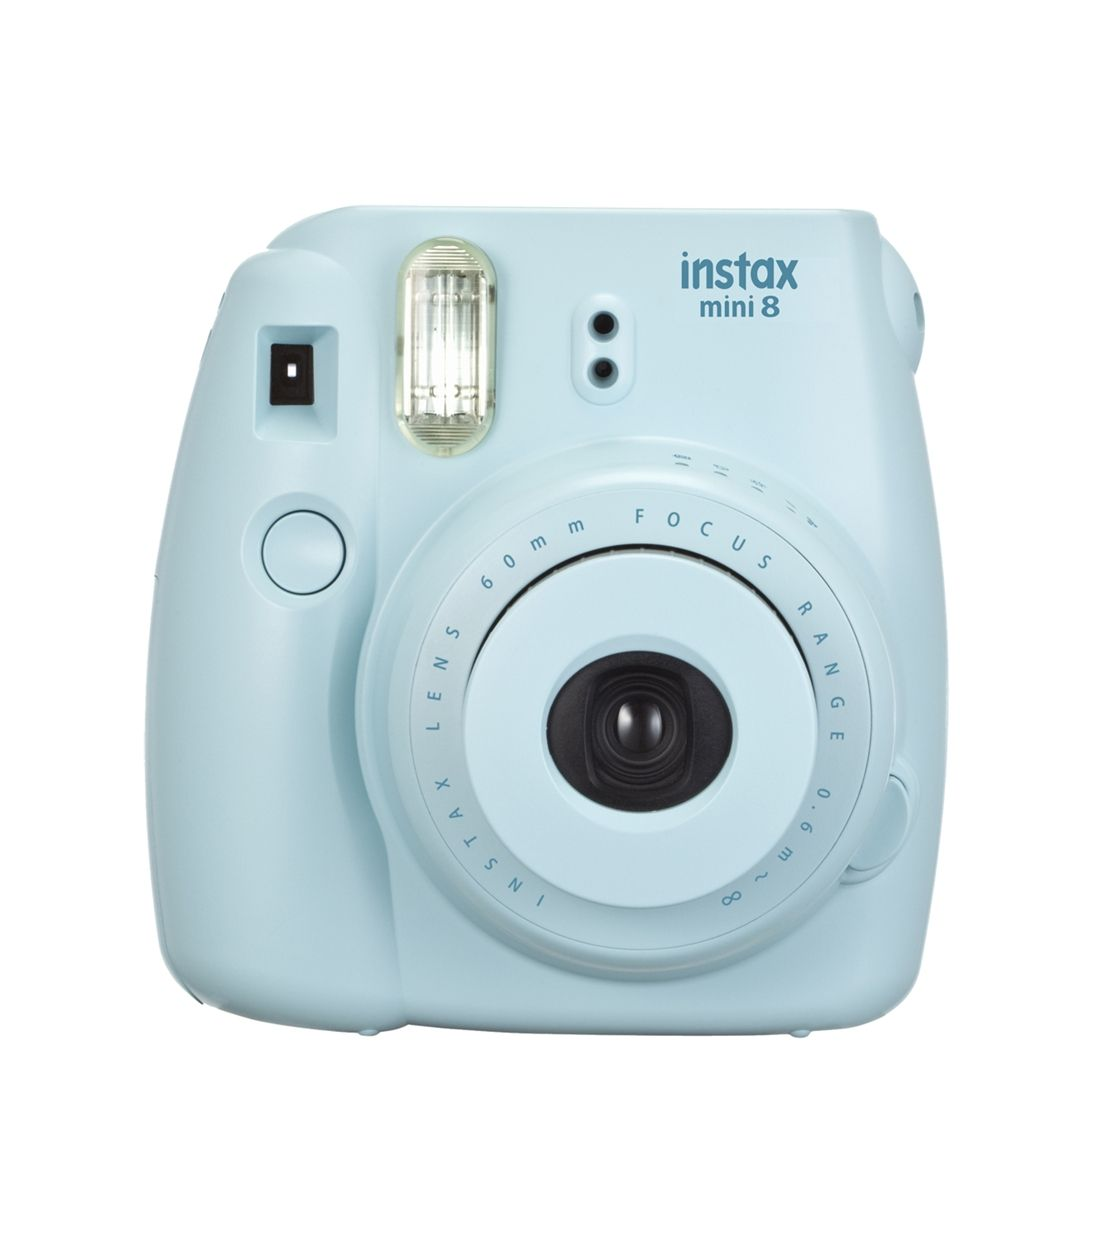 fujifilm instax camera mini 8 hema wensen pinterest. Black Bedroom Furniture Sets. Home Design Ideas